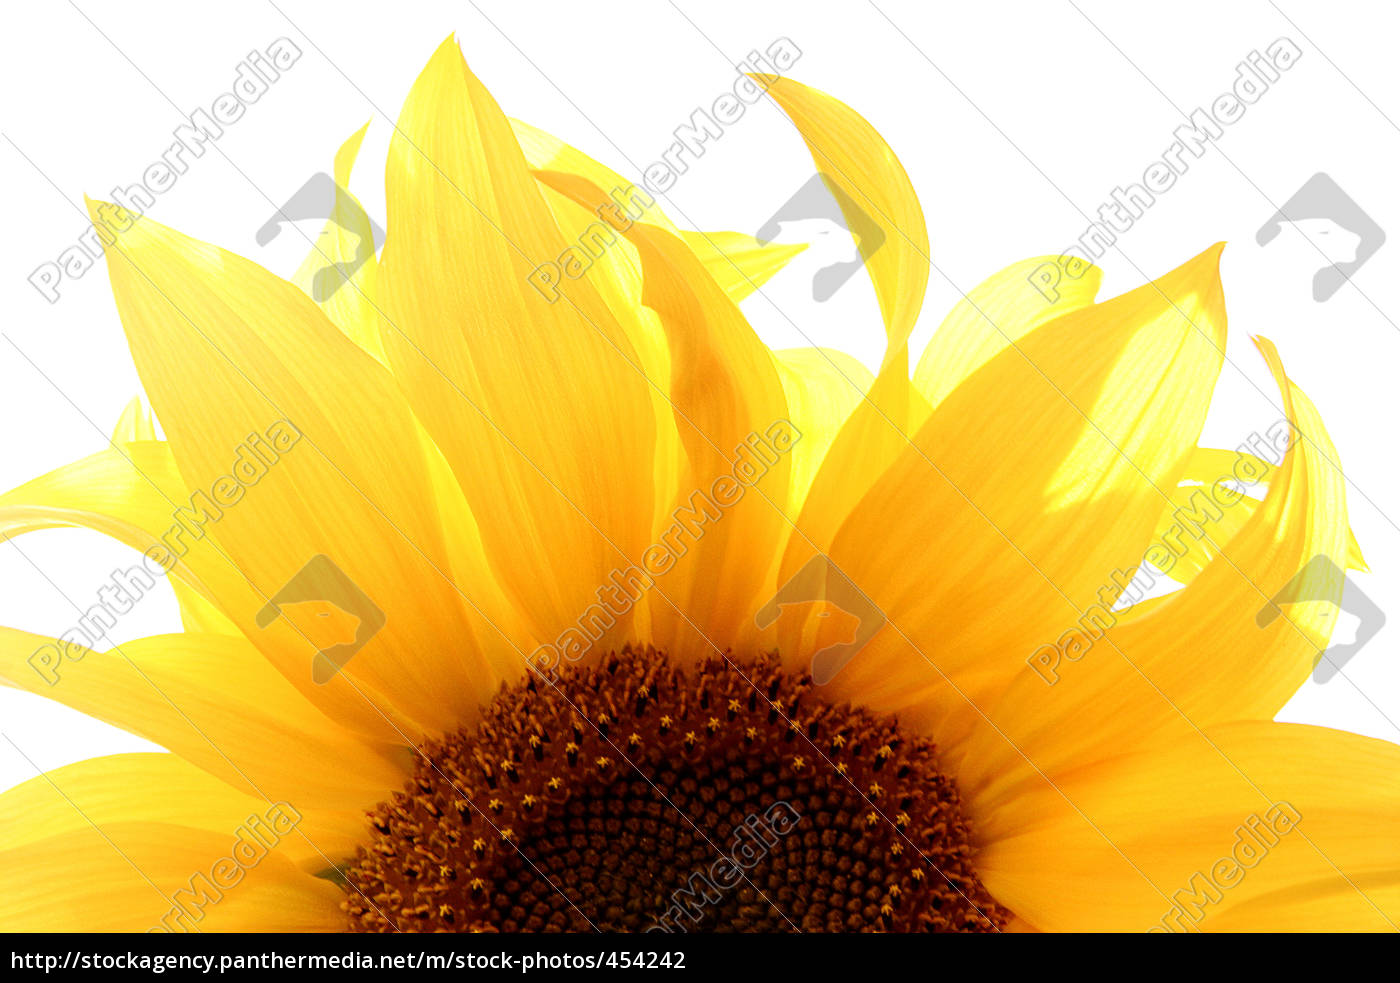 half, sunflower - 454242